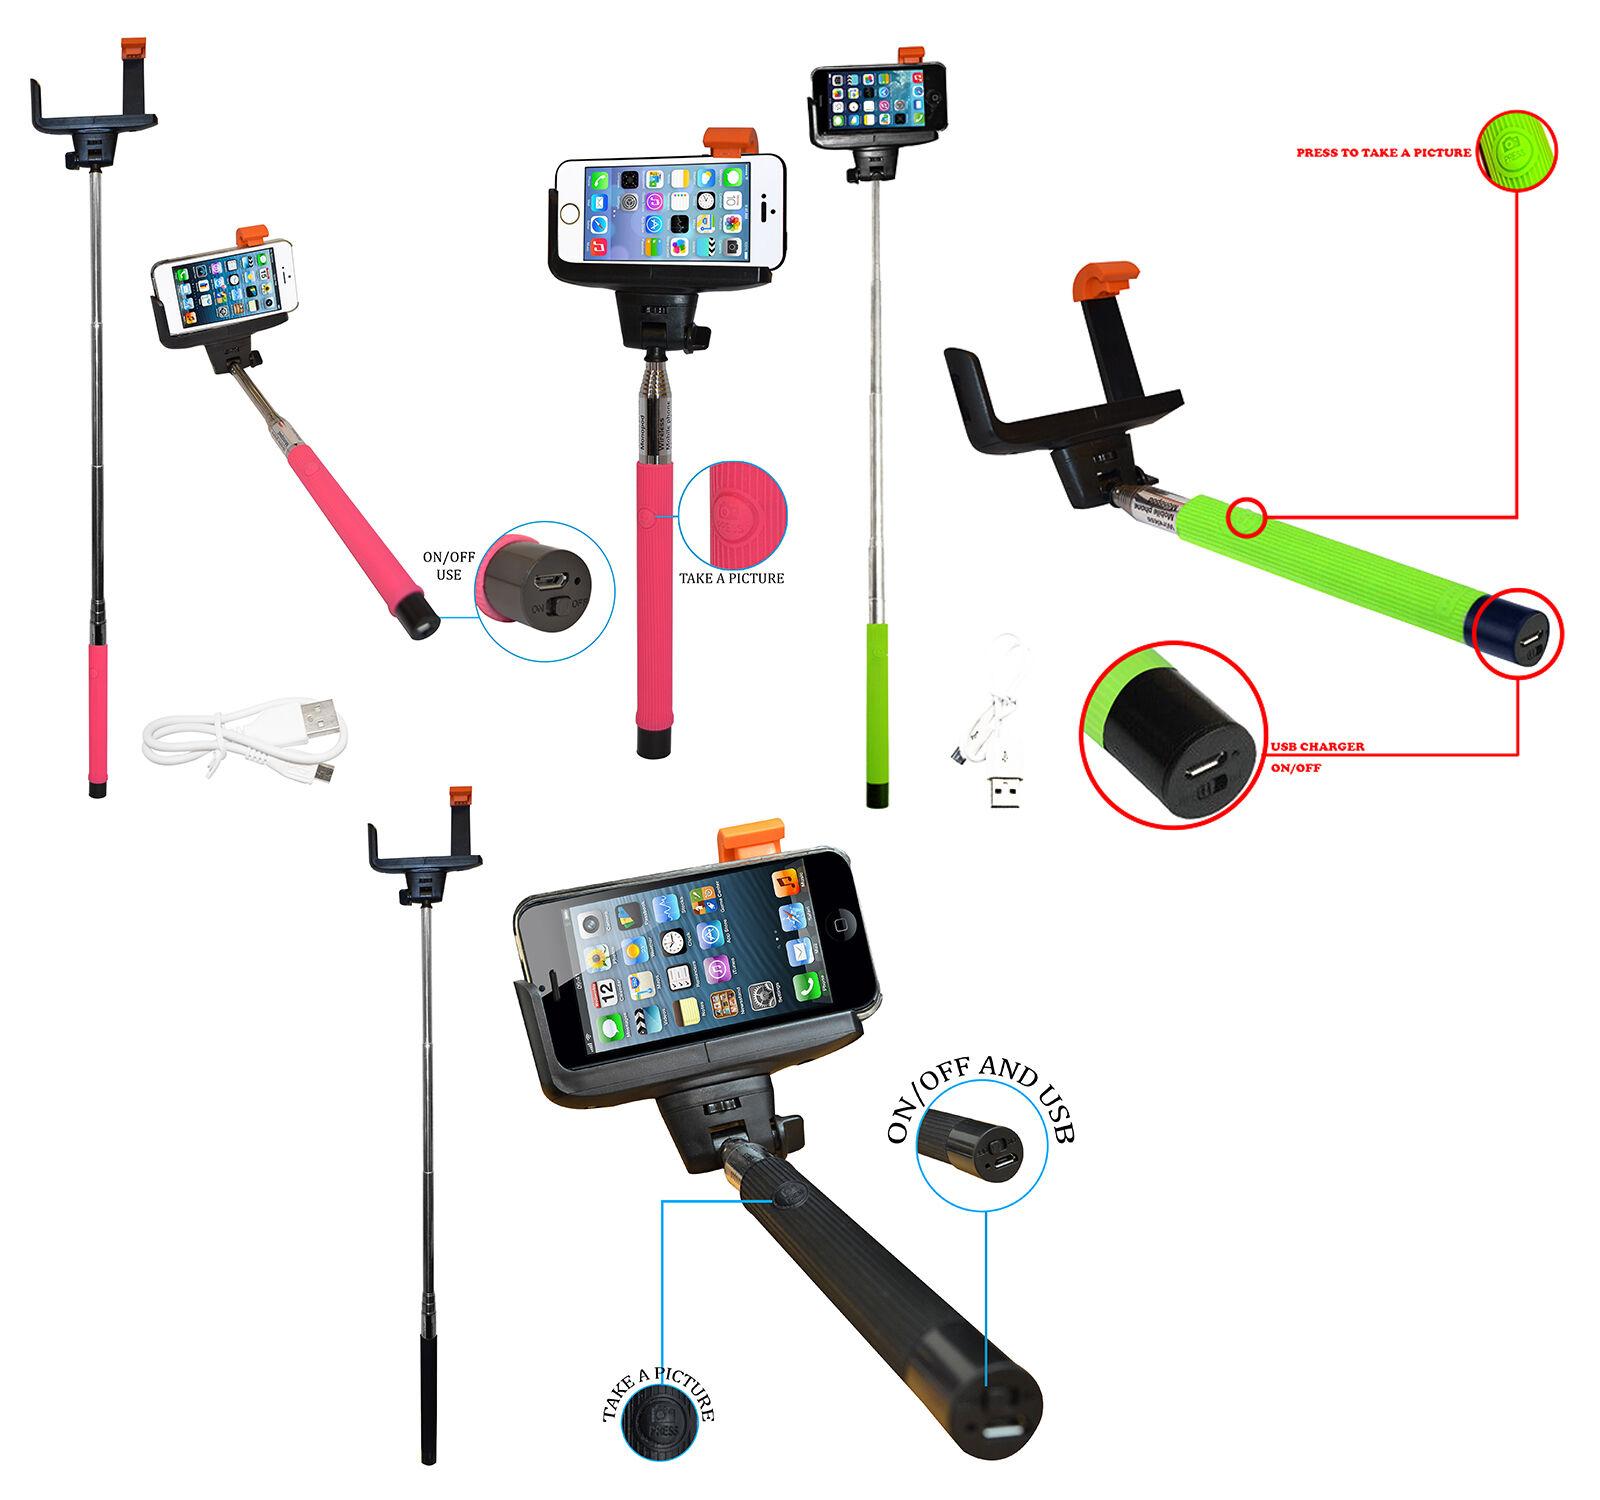 Wireless Bluetooth Mobile Phone Telescopic Monopod Camera